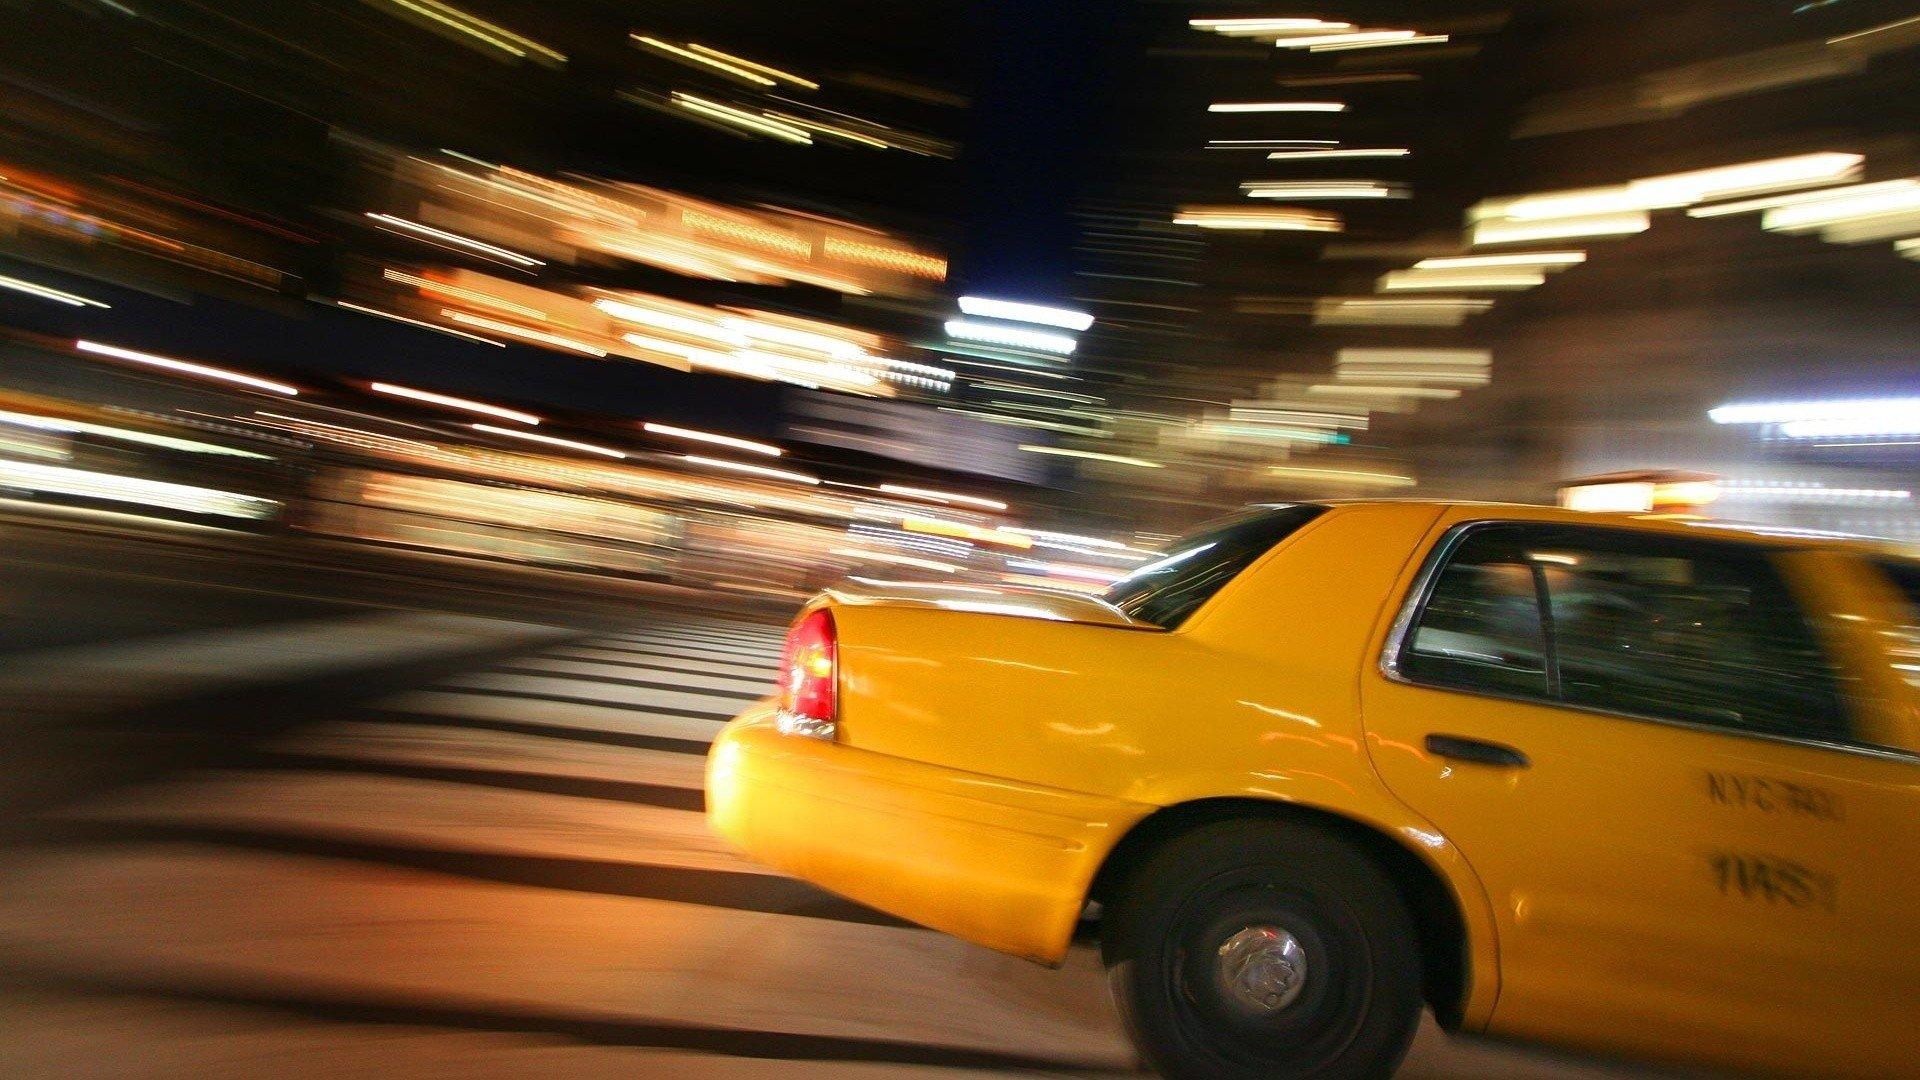 New York City Taxi Hd Wallpaper Hintergrund 1920x1080